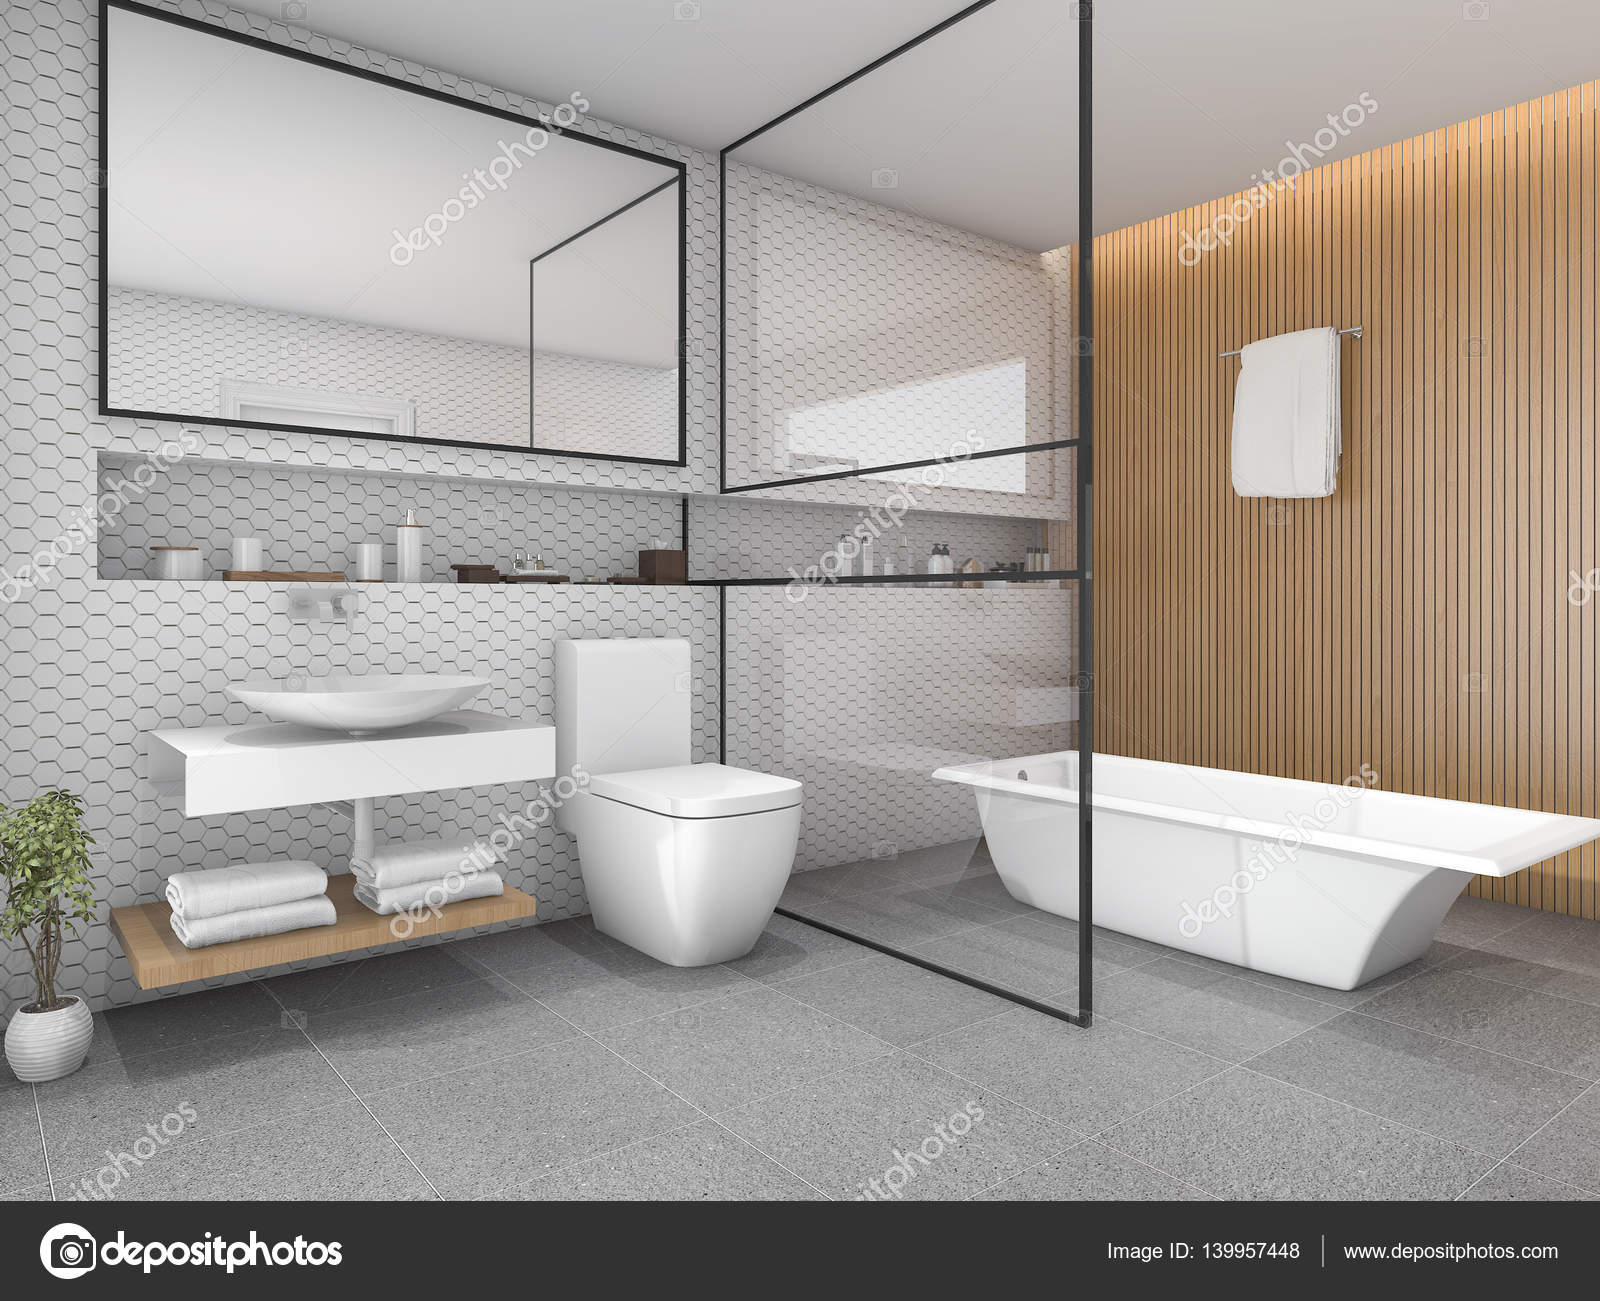 D rendering bianco esagono piastrelle bagno con arredamento in